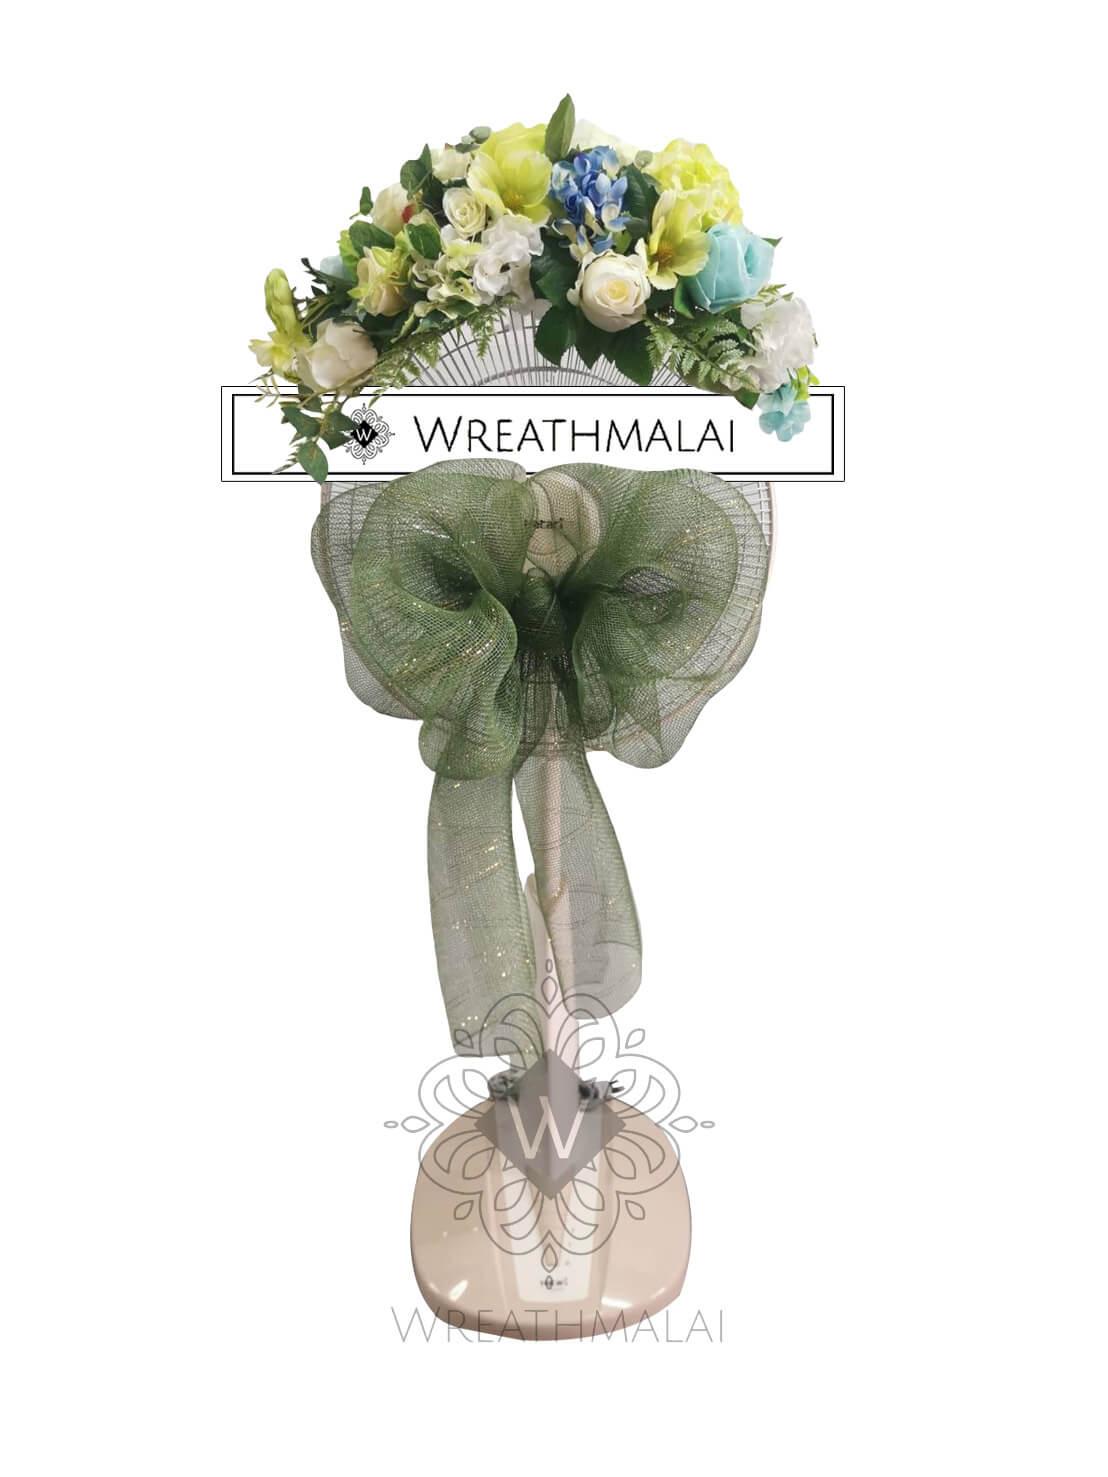 "WF021 พวงหรีด ""ผกากรอง""  SHARP/HATARI 16 นิ้ว/18 นิ้ว เกลียวโบว์สีเขียว และดอกไม้สีพาสเทลจัดช่อสวยงามด้านบน"